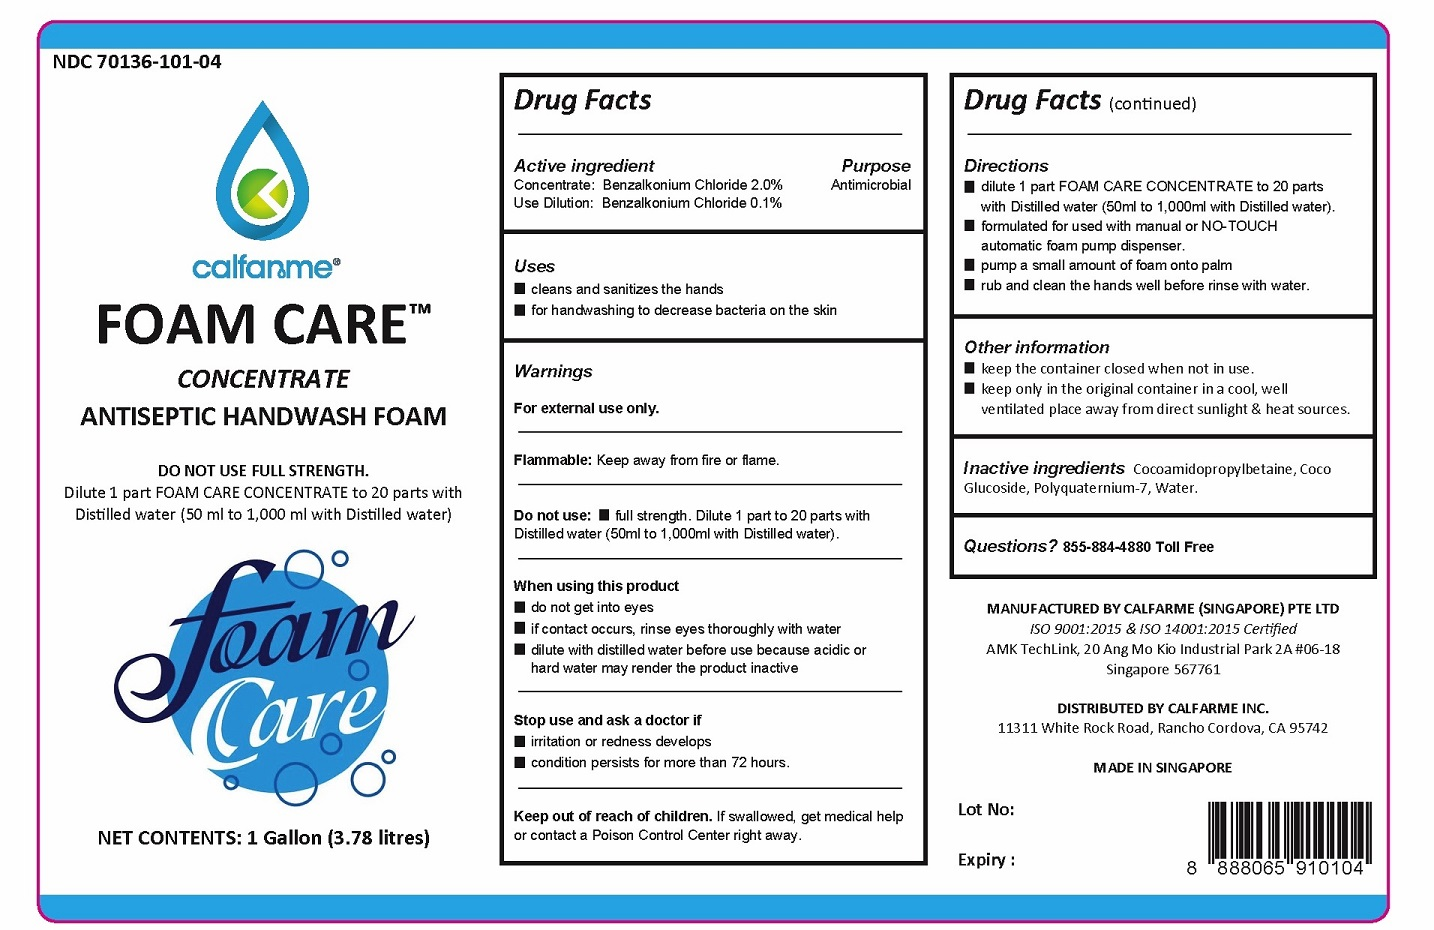 BENZALKONIUM CHLORIDE - FOAM CARE (Calfarme)